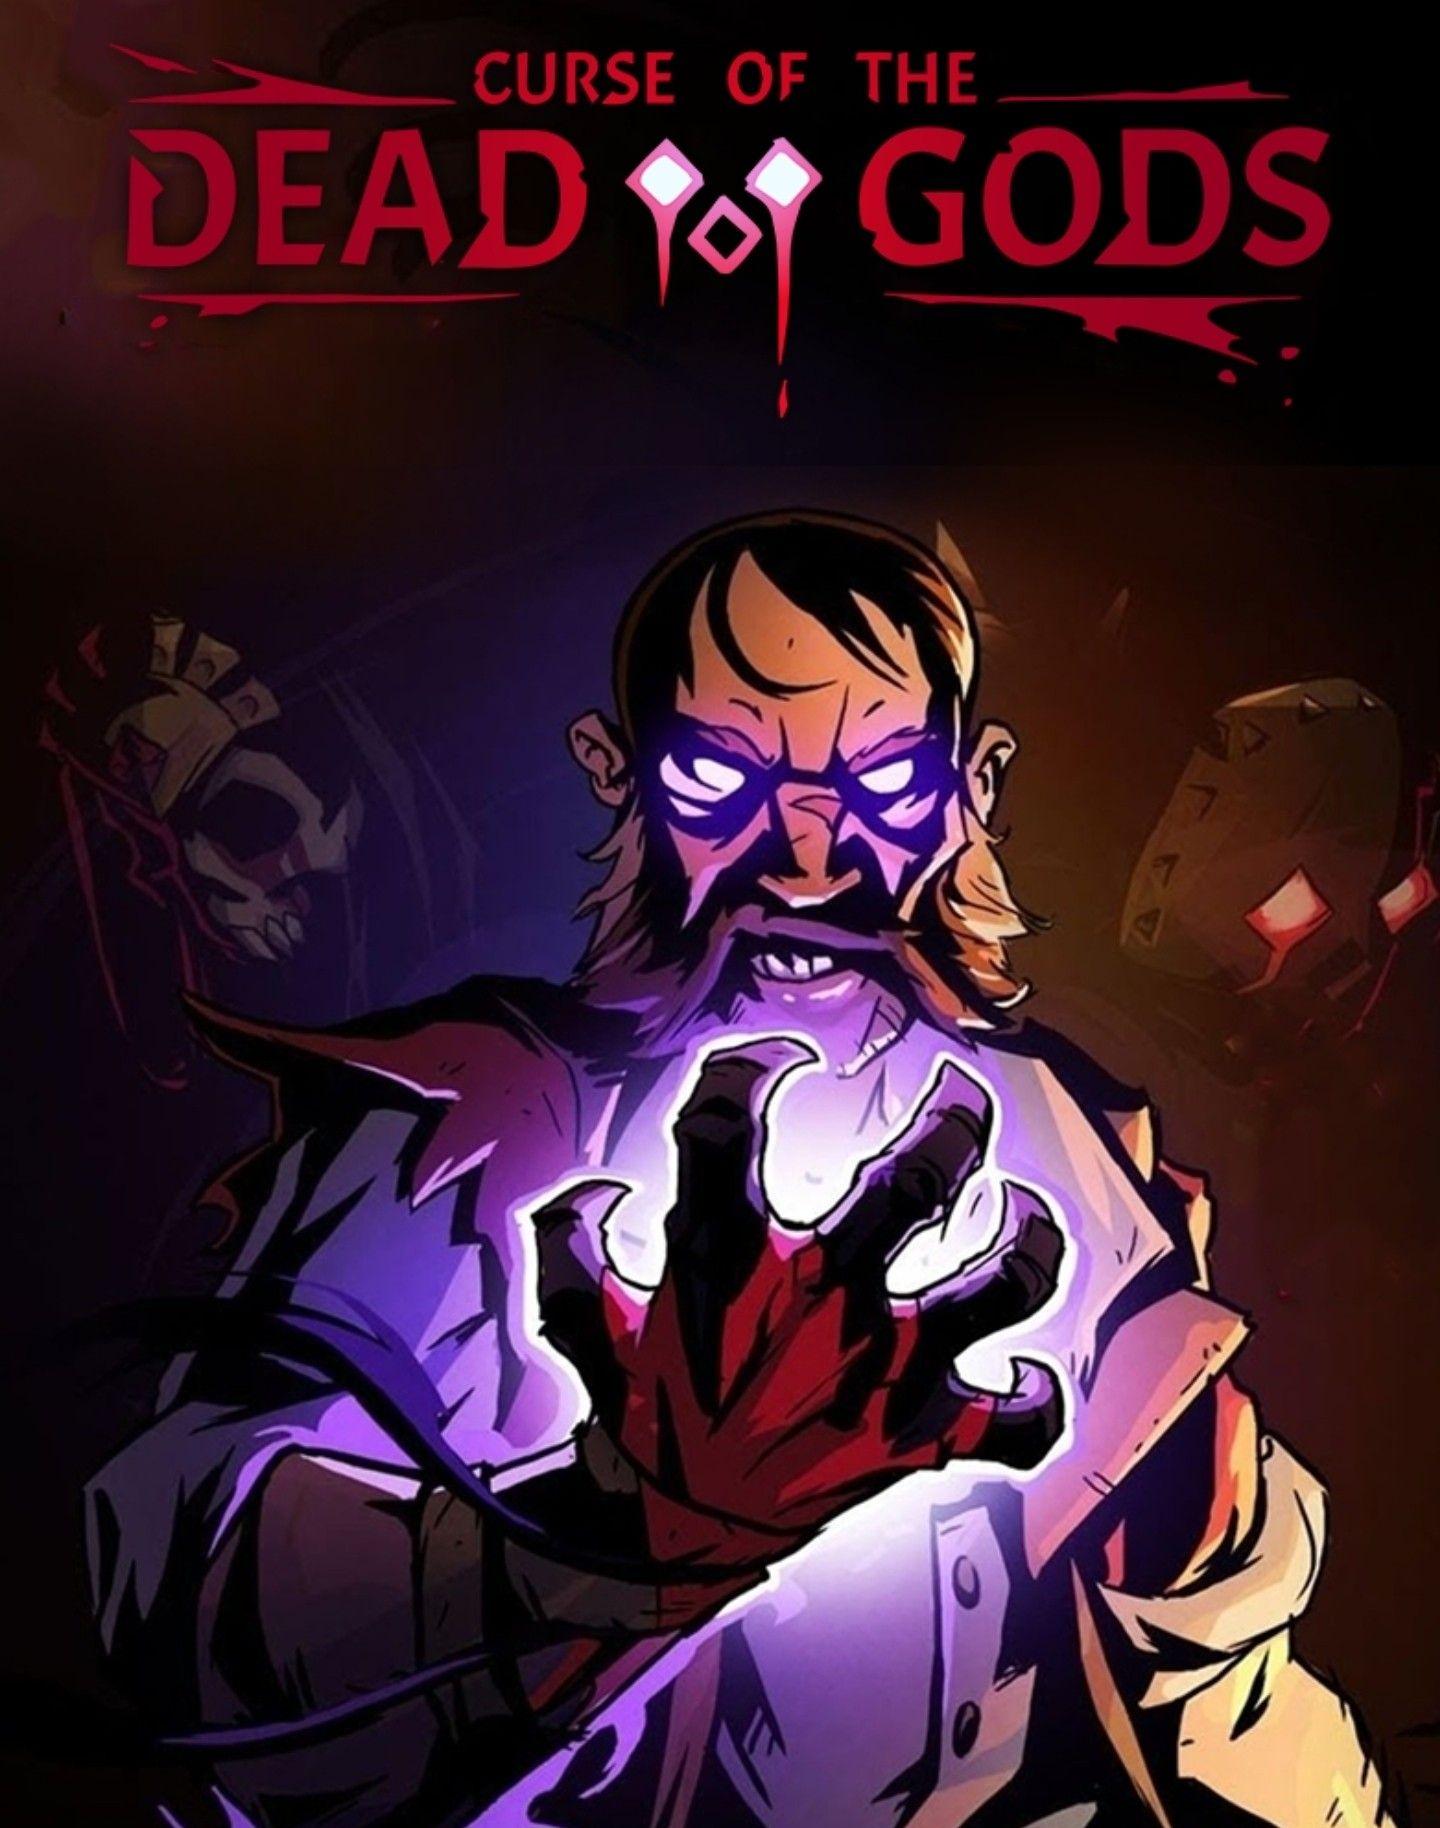 [Curse of the Dead Gods] Nintendo Switch eshop